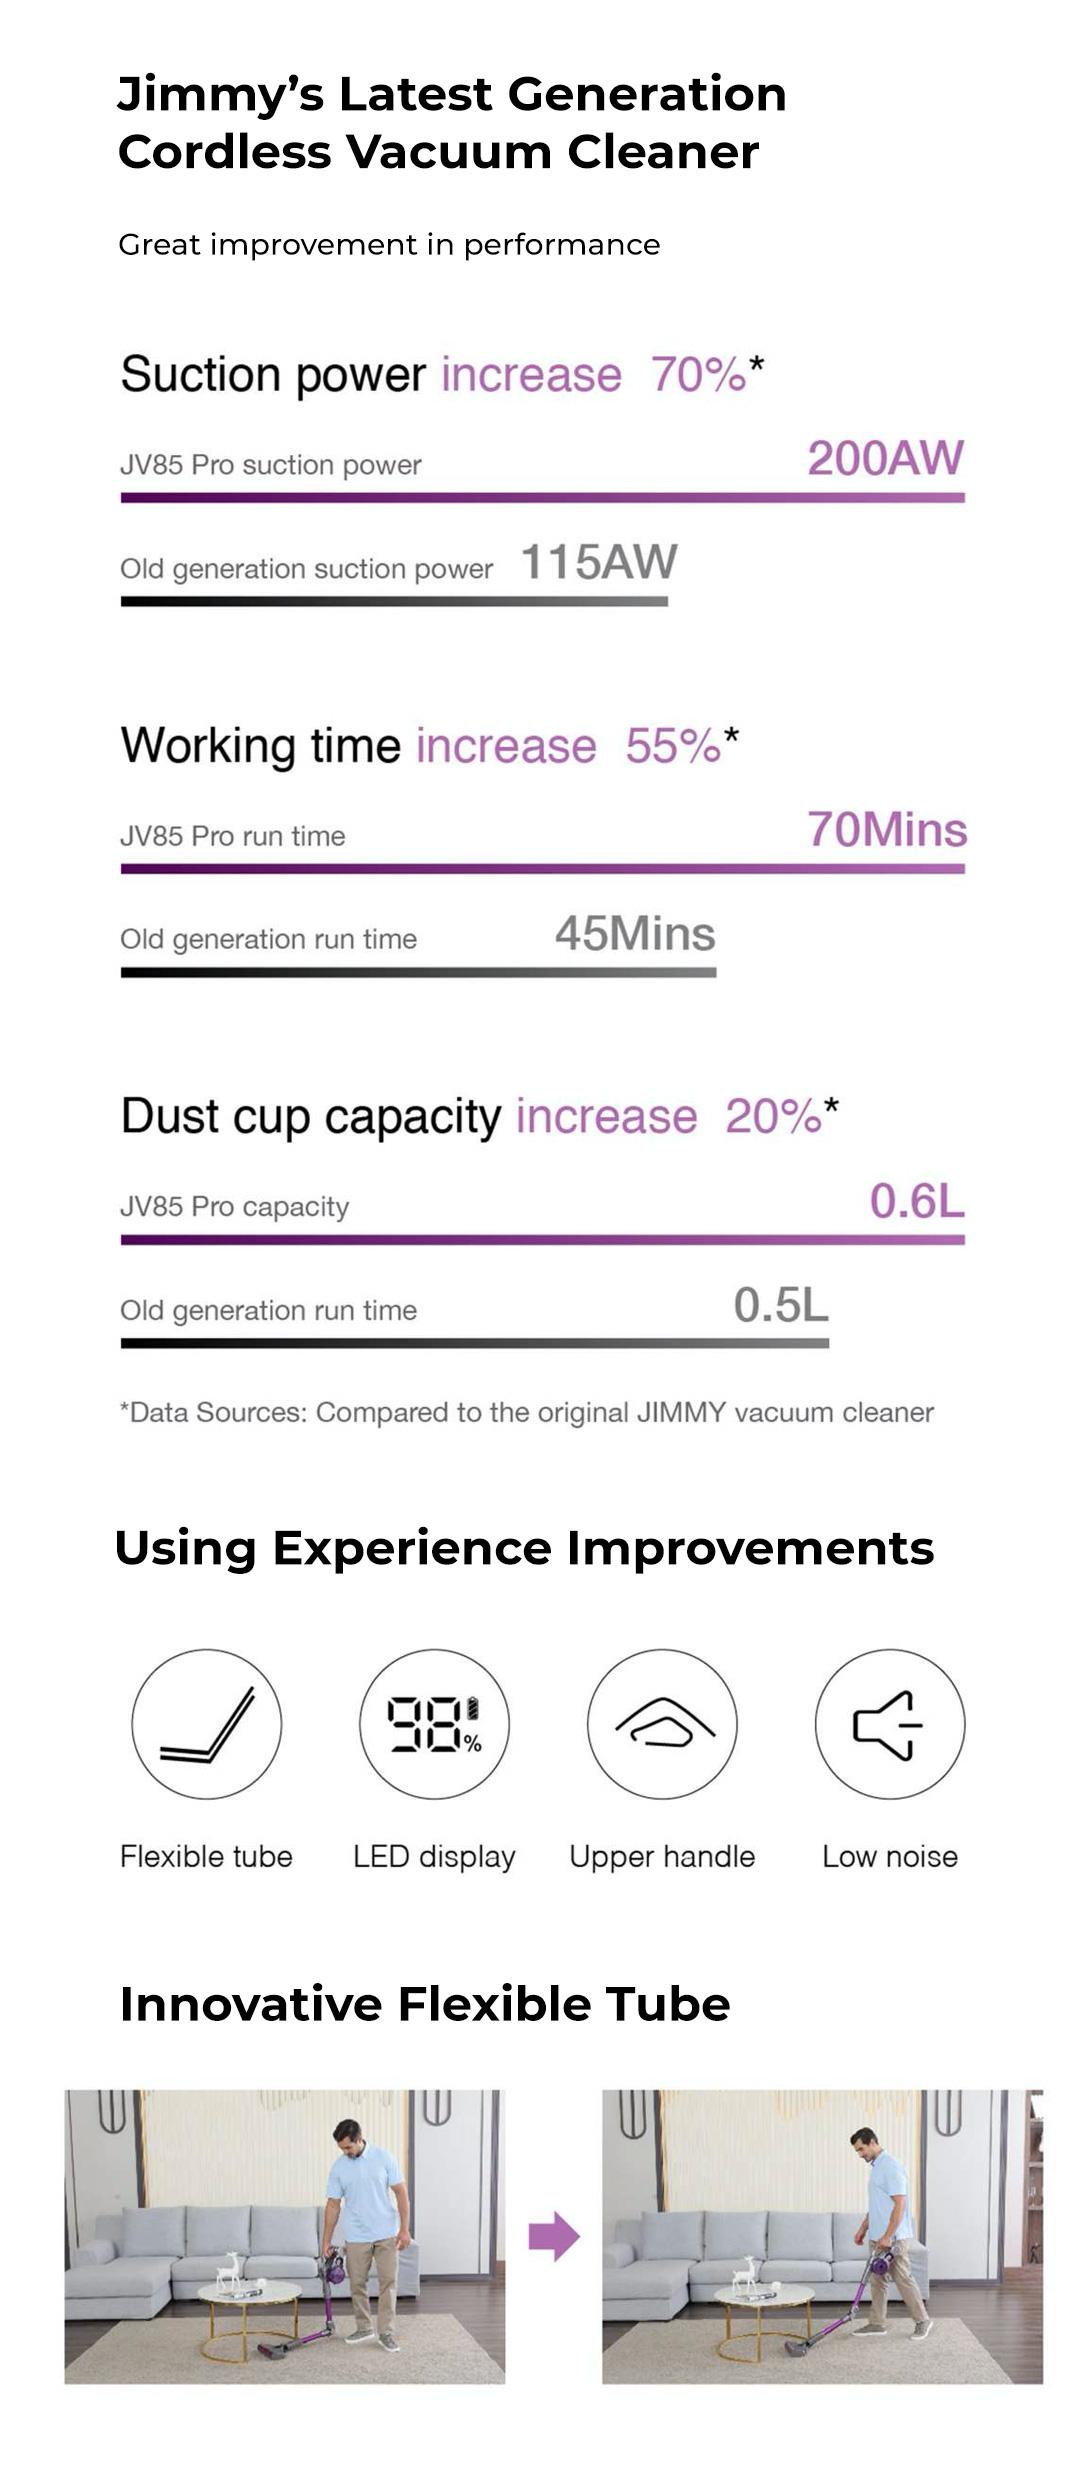 Xiaomi Jimmy Cordless Handheld Vacuum Cleaner JV85 Pro